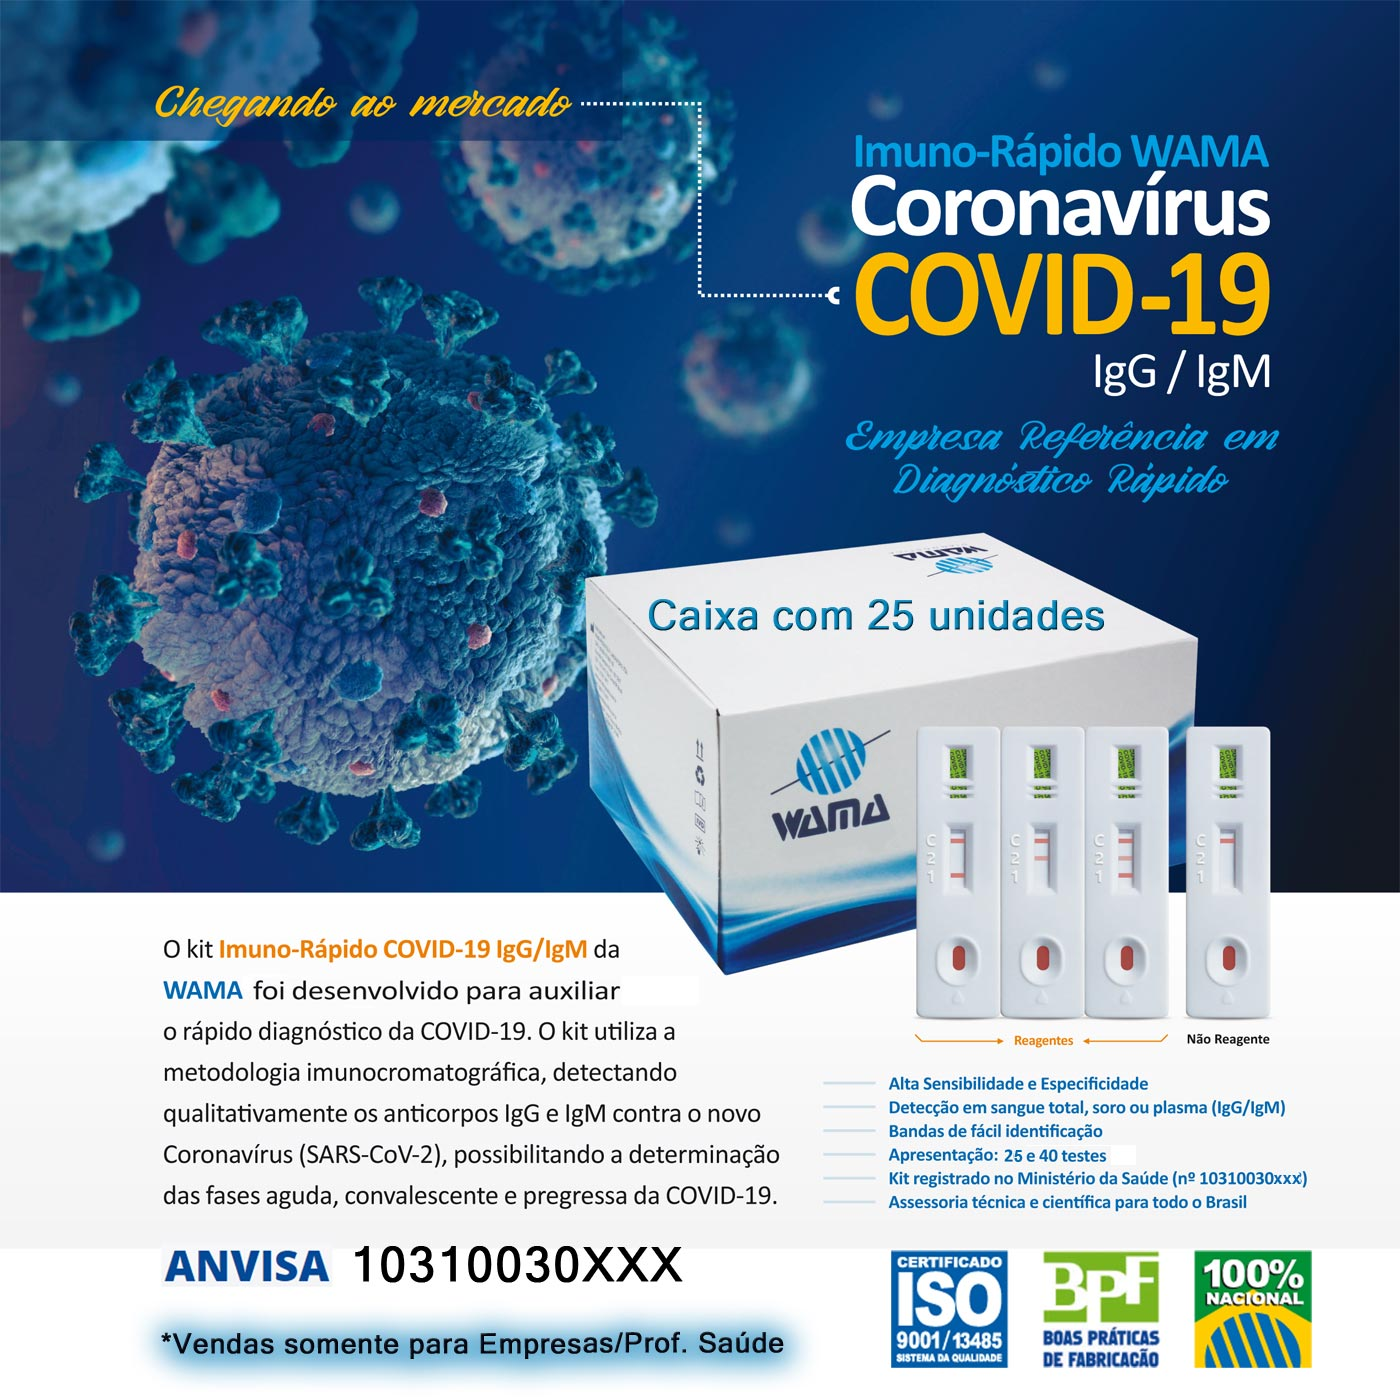 Teste Rápido COVID-19 IgM/IgG - Wama - Caixa com 25 unidades  - Testes Para Drogas e COVID-19. Máscaras e Como Parar de Beber e Fumar